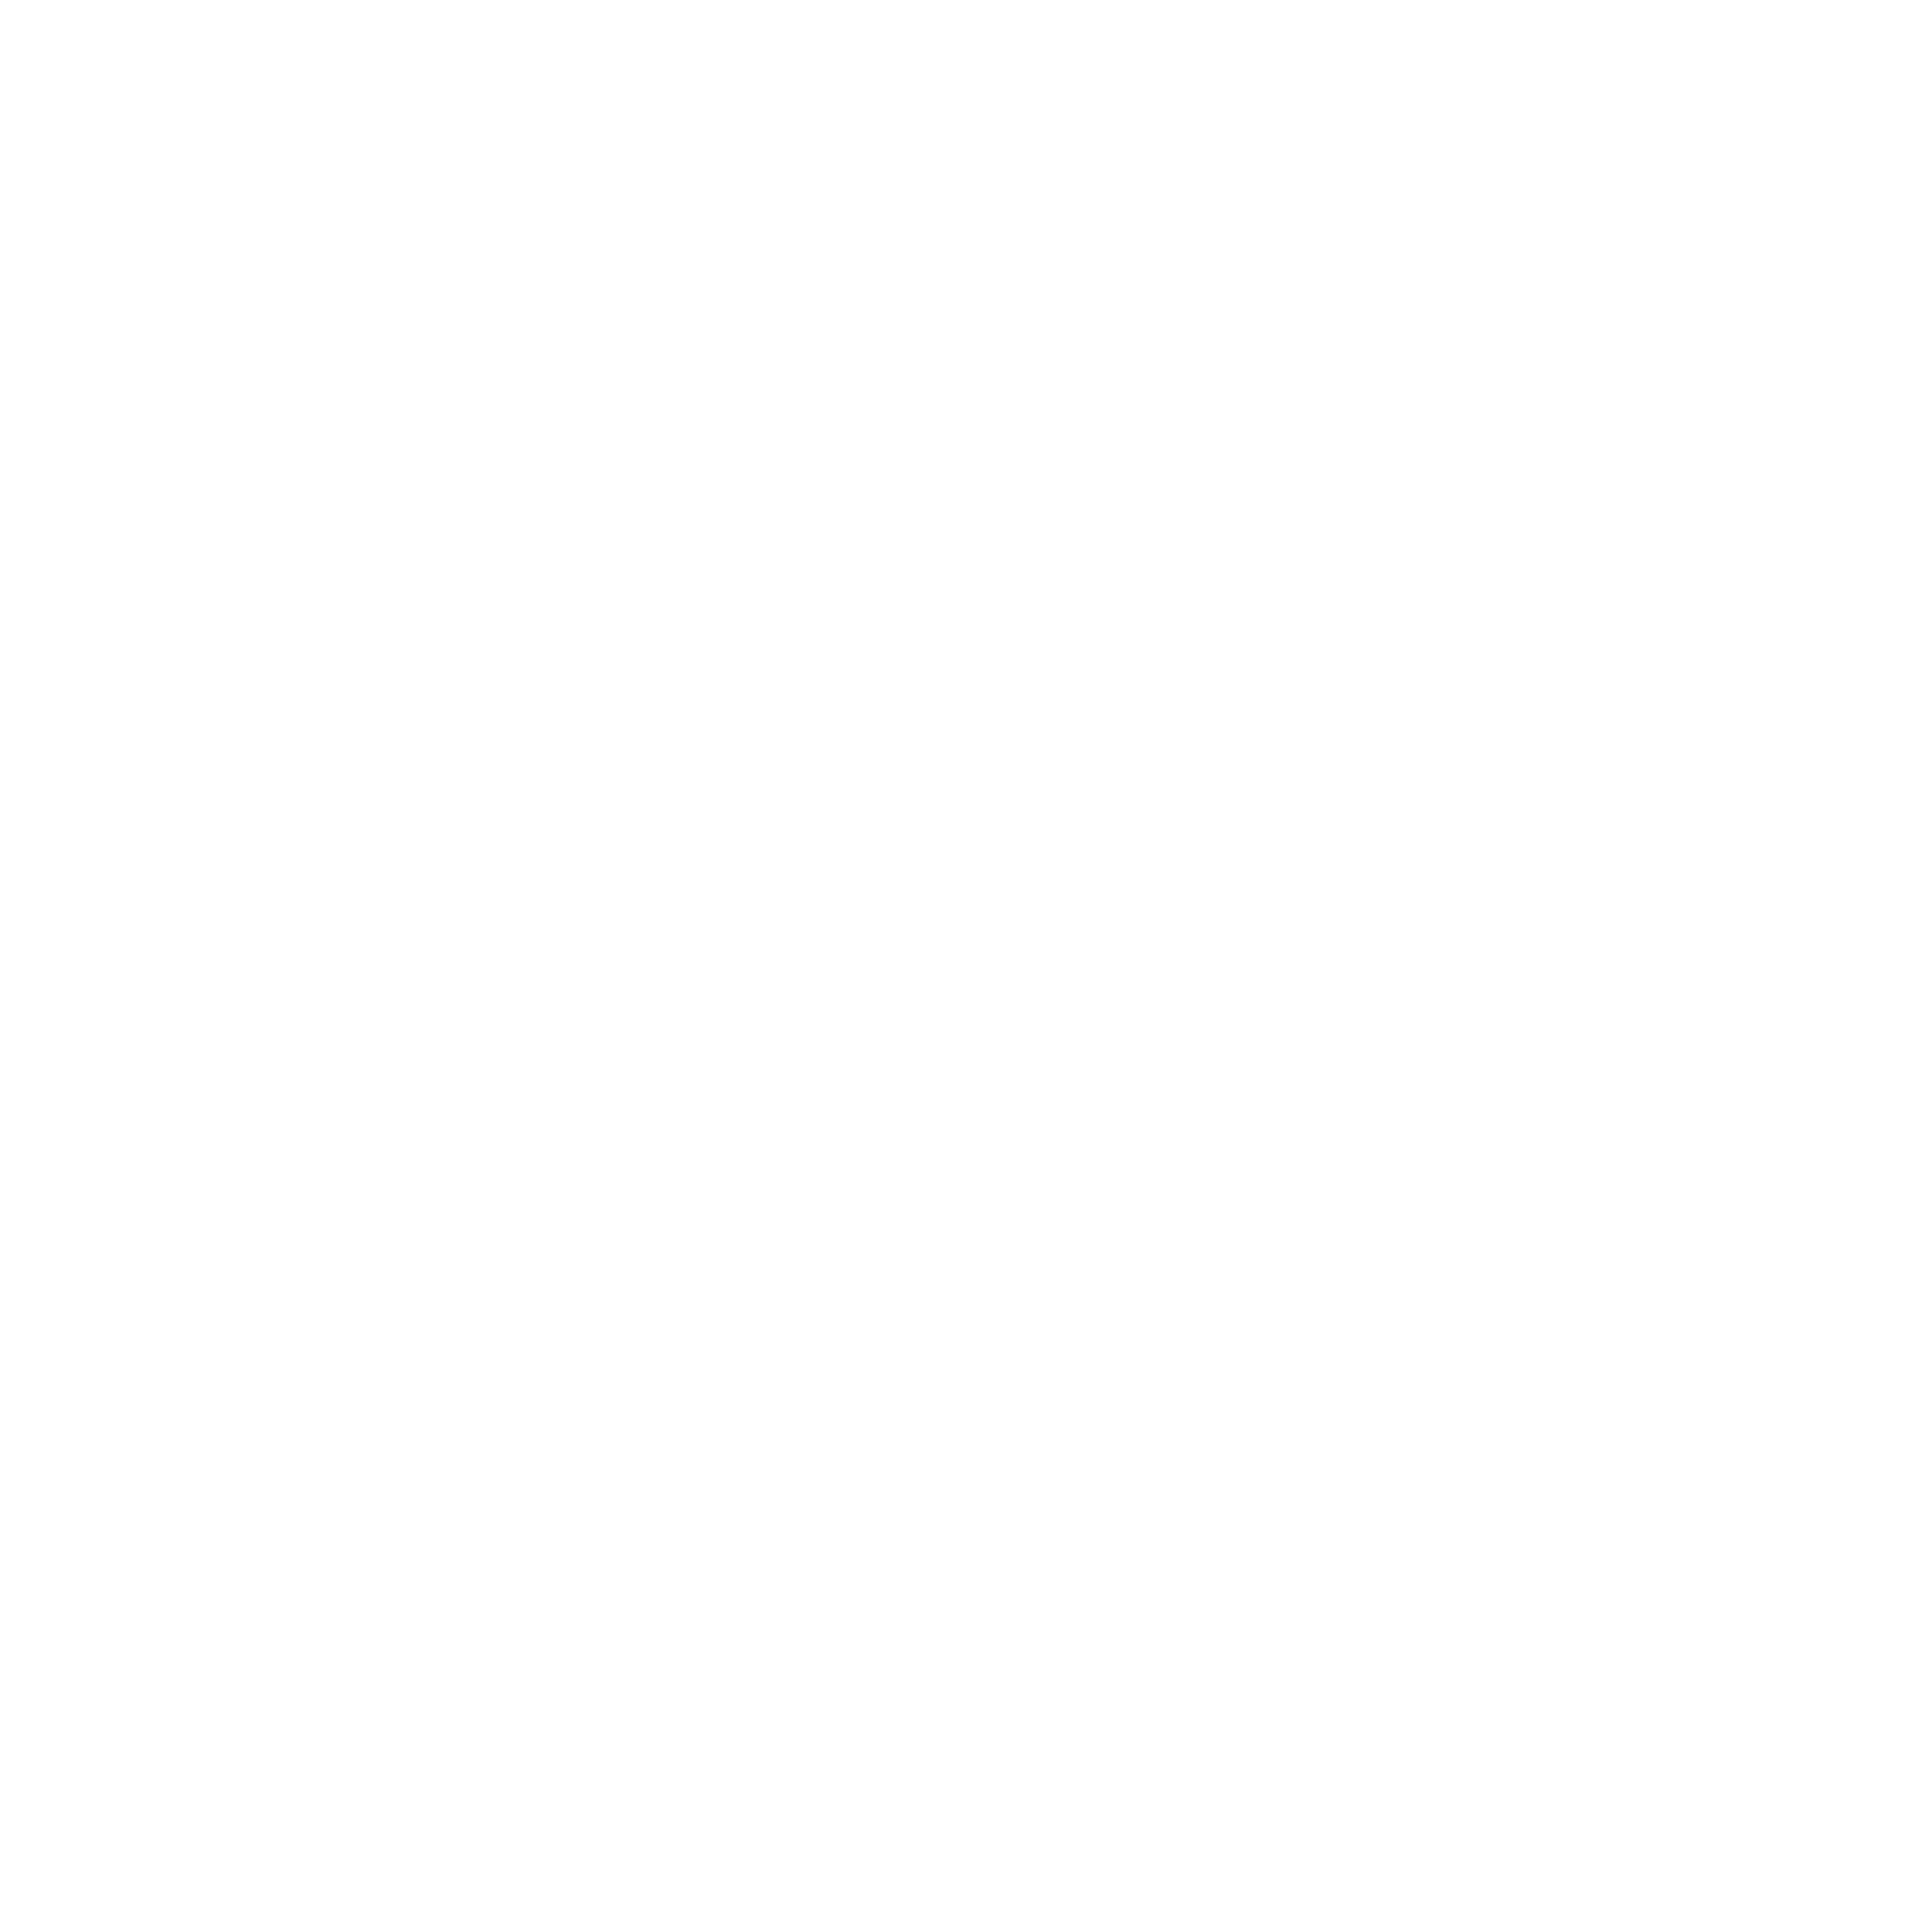 Tarka-Talent-Logos-06